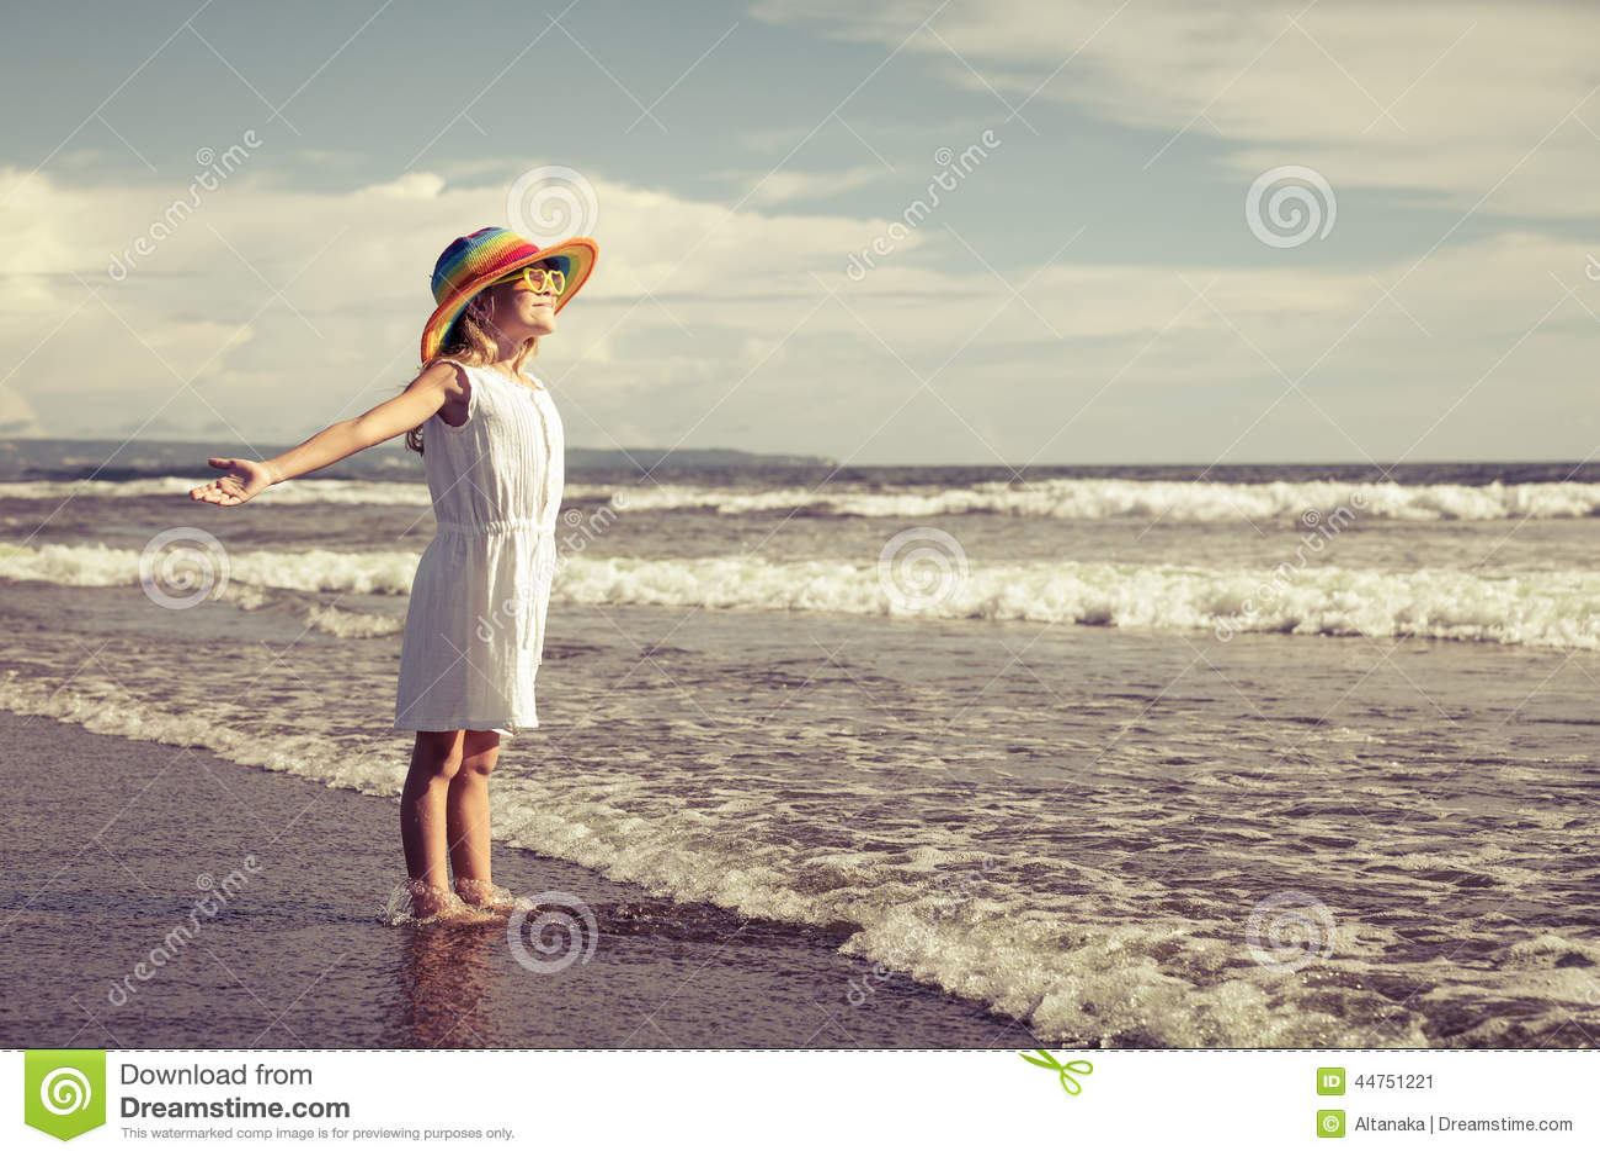 Little Girl Standing On The Beach - 162.4KB